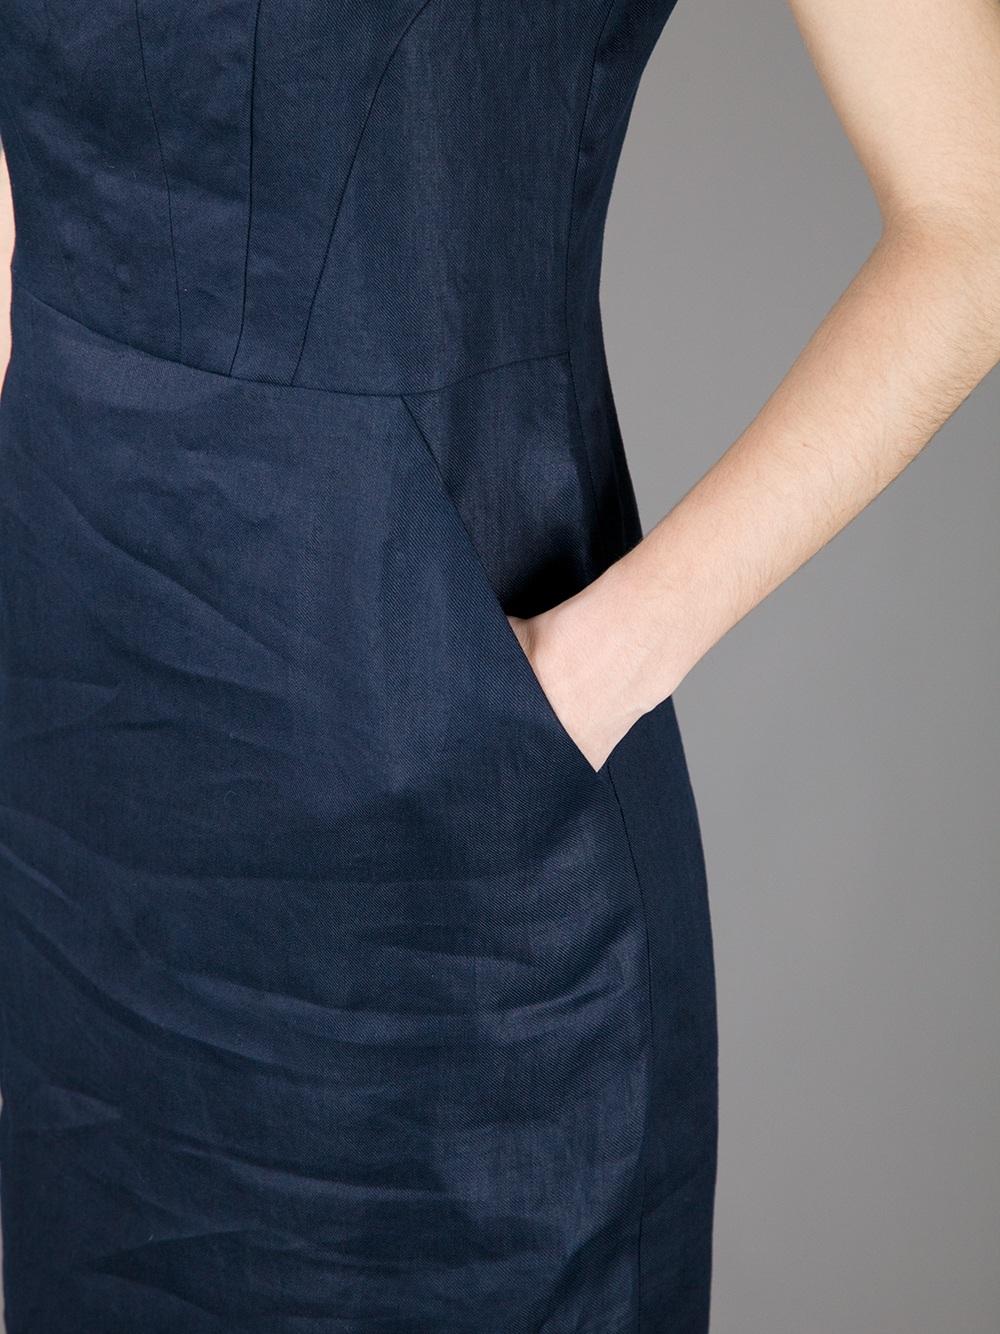 e69e5190177 Navy Blue Linen Dress Uk